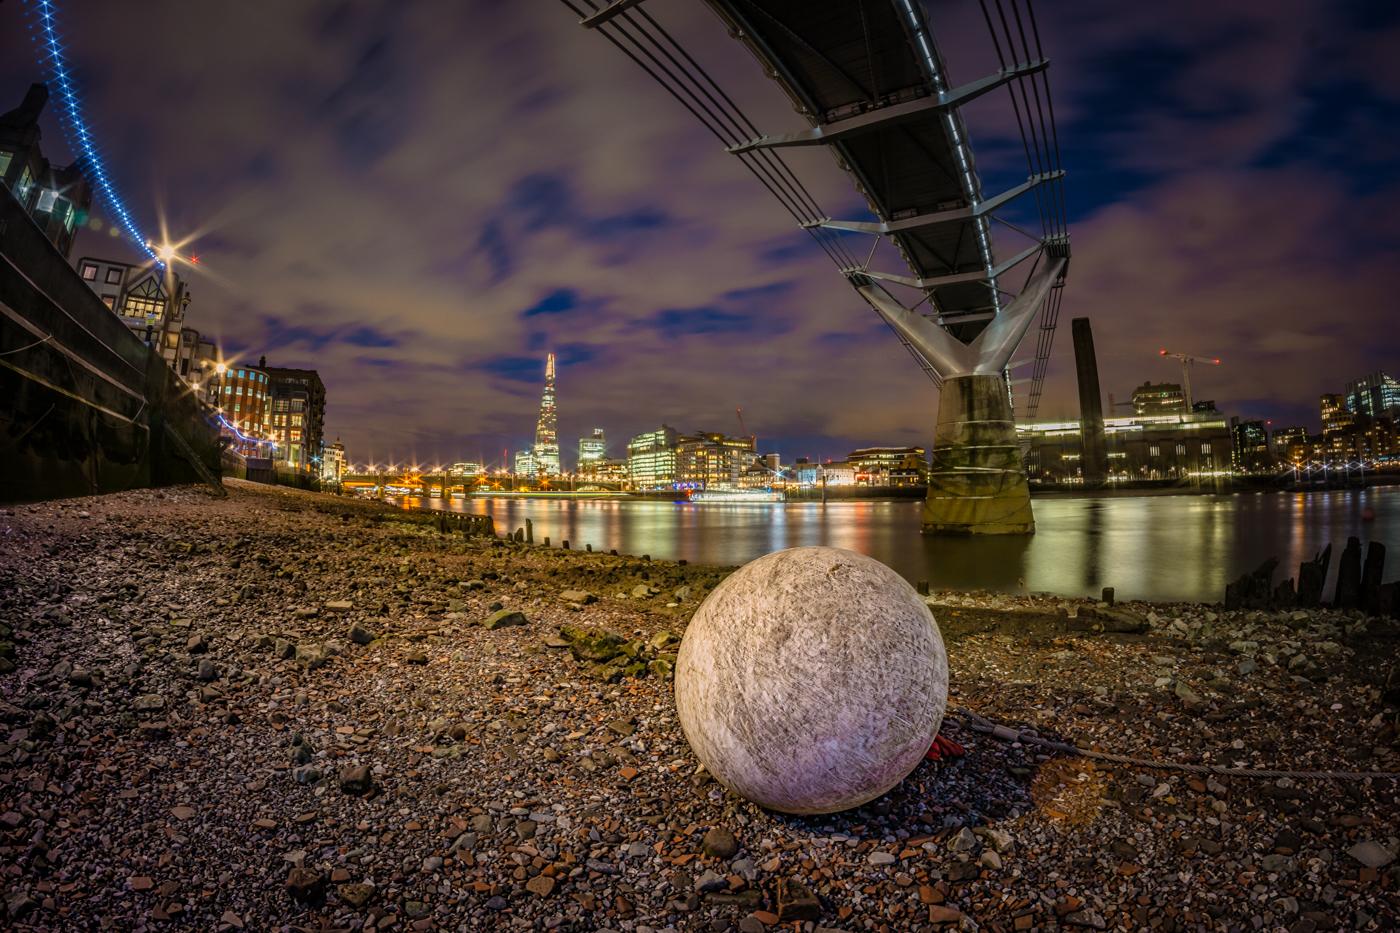 Thames Buoy